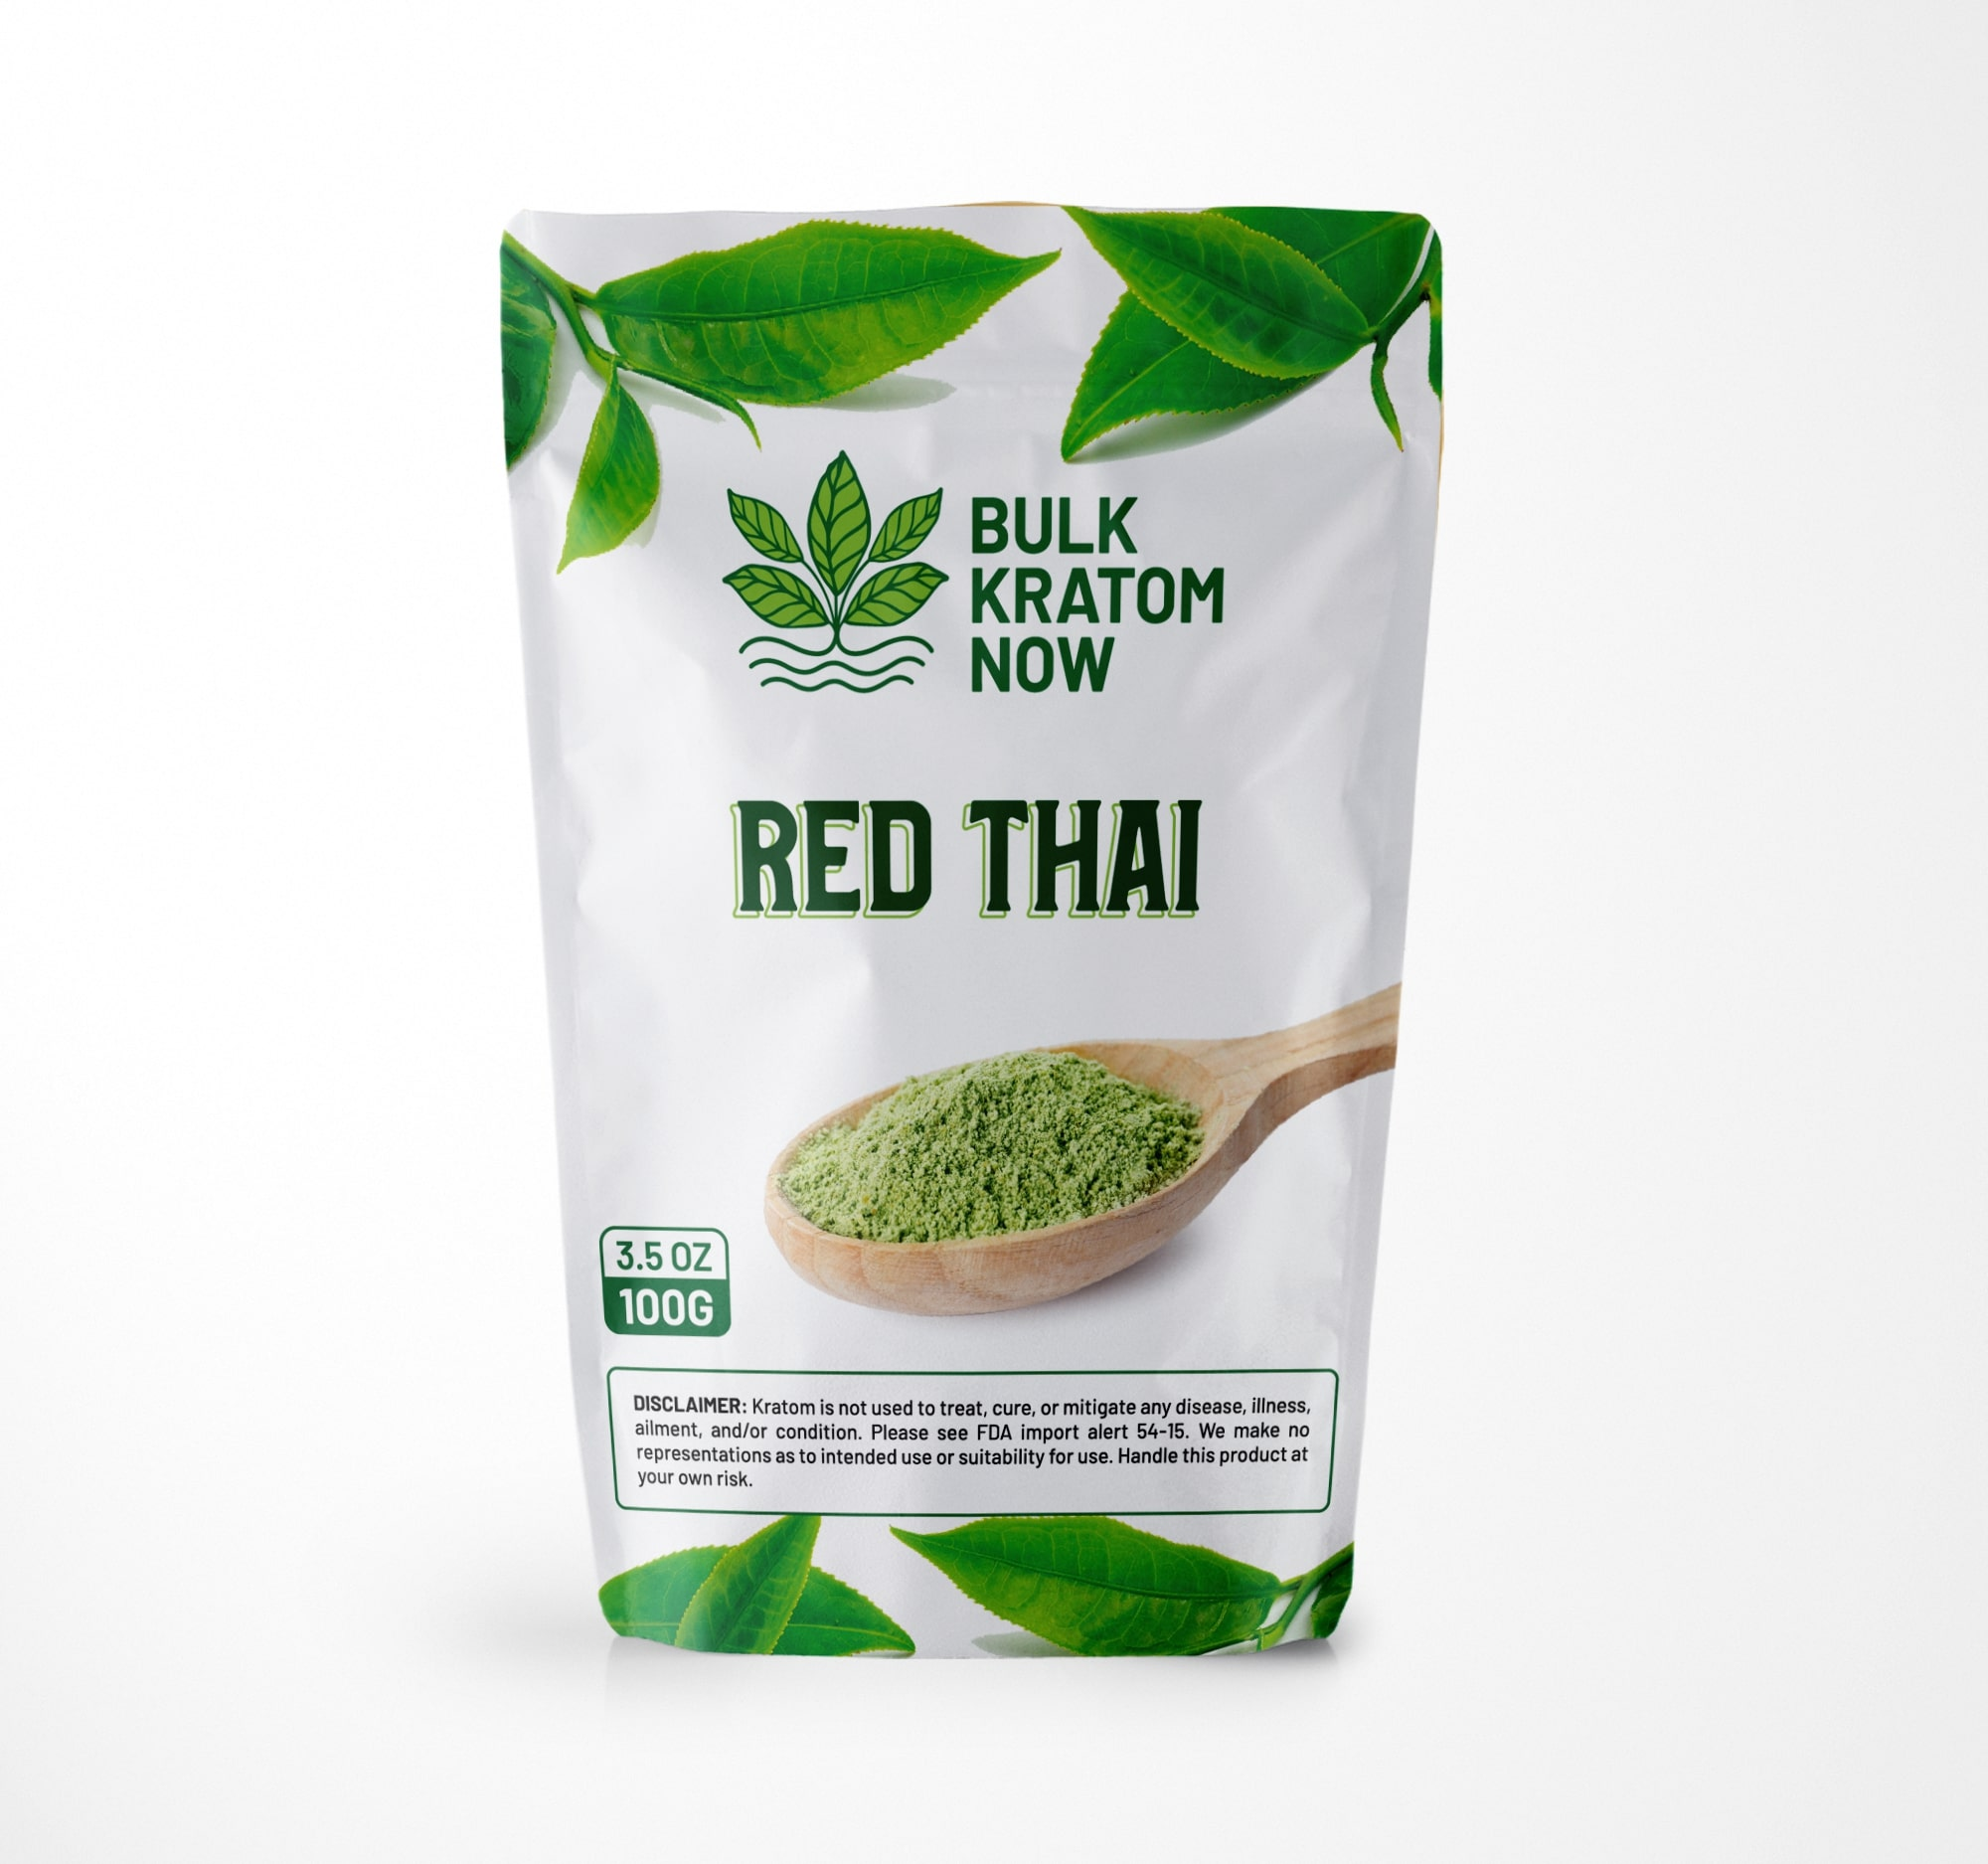 Red Thai Bulk Kratom